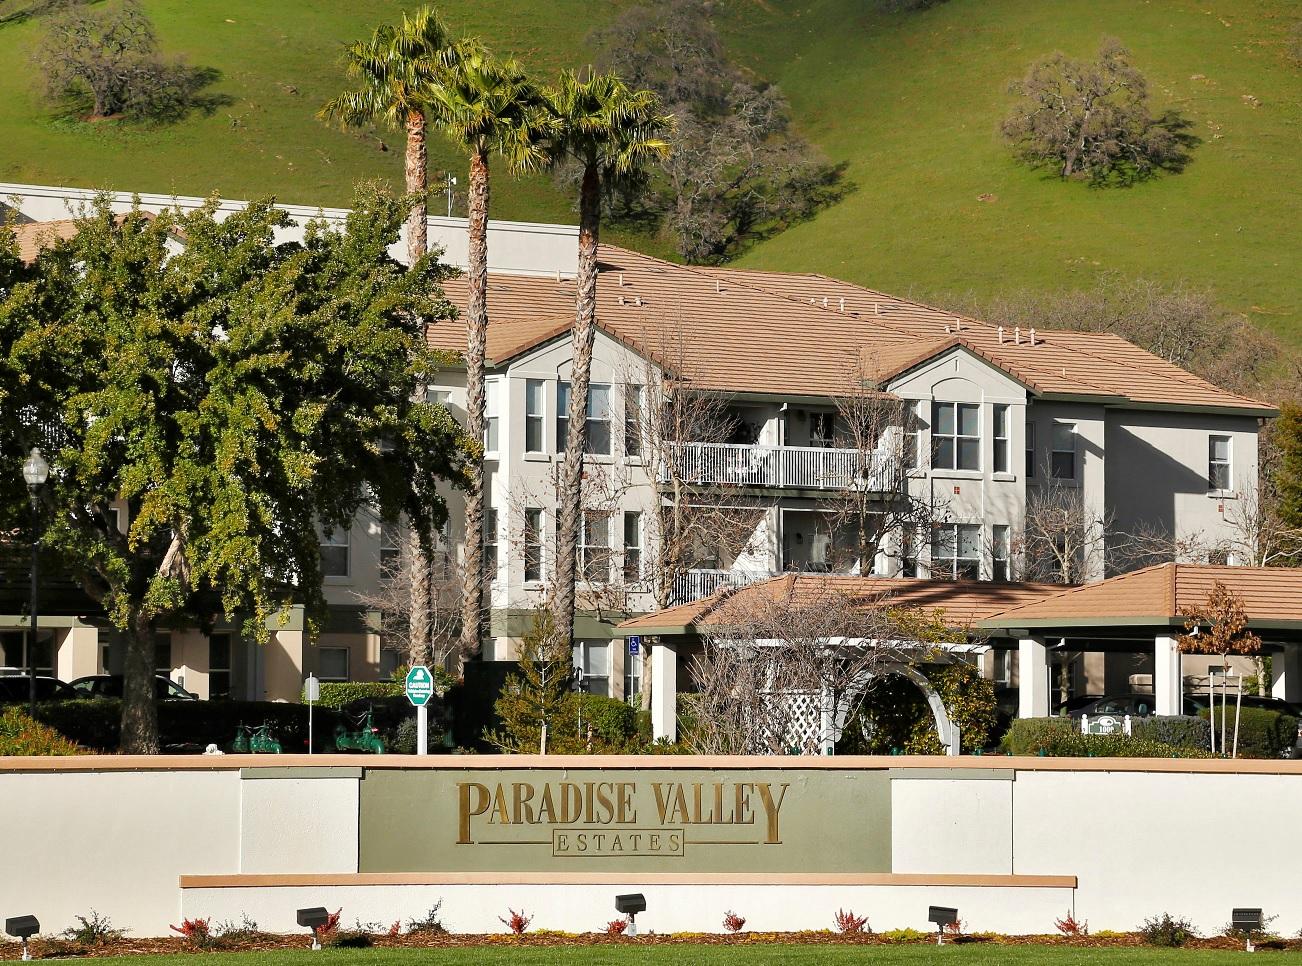 Exterior view of Paradise Valley Estates